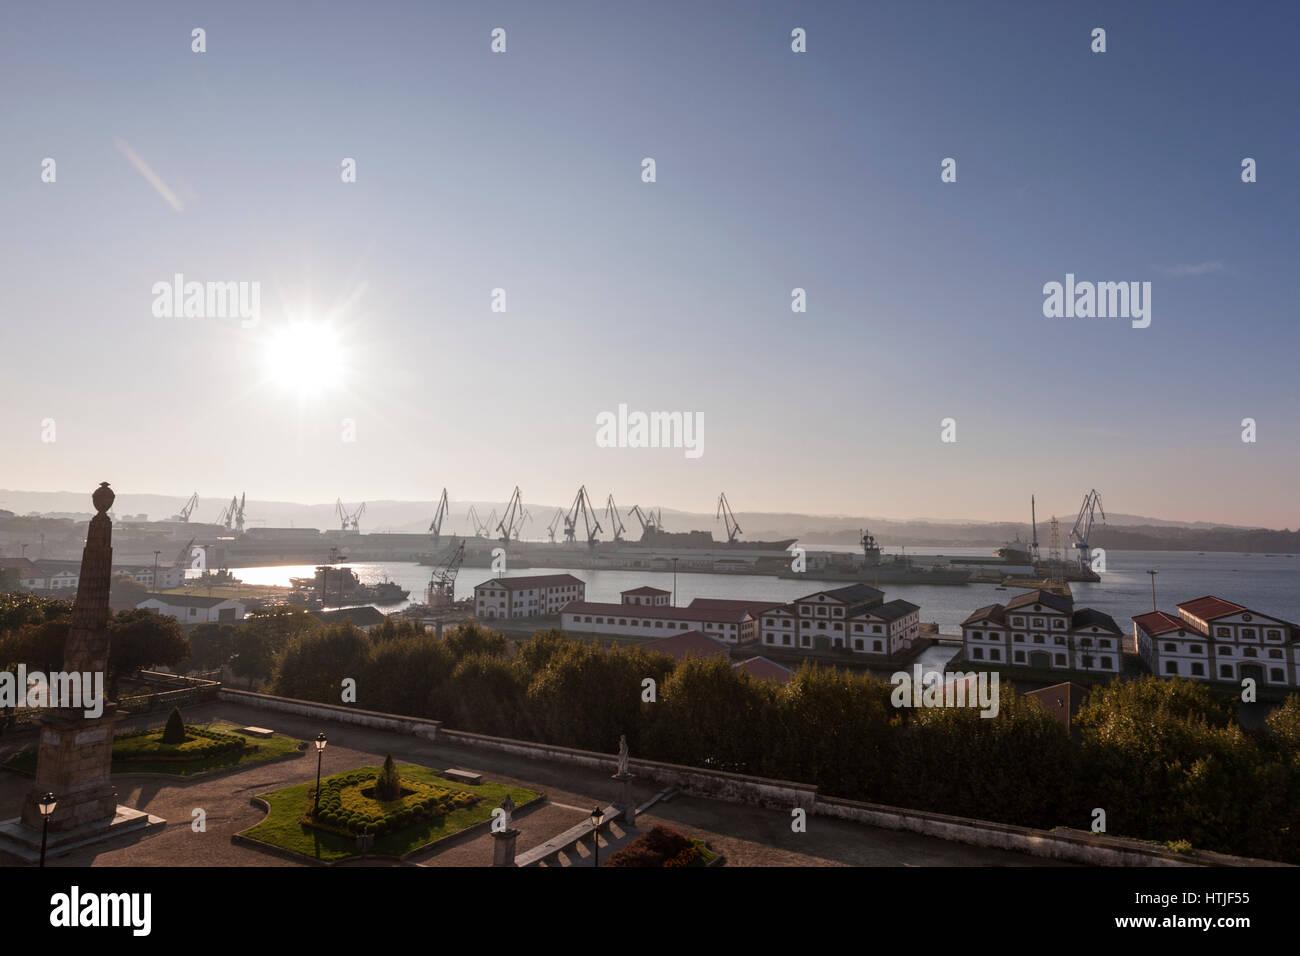 Bazan, Naval Base at sunrise, Military arsenal in Ferrol from Parador, A Coruña, Galicia, Spain - Stock Image